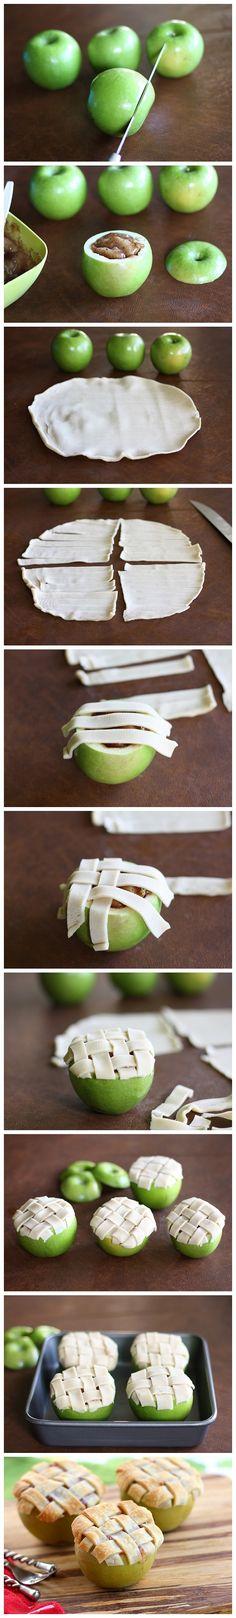 Apple-Lattice Pies apple pies baked into apples